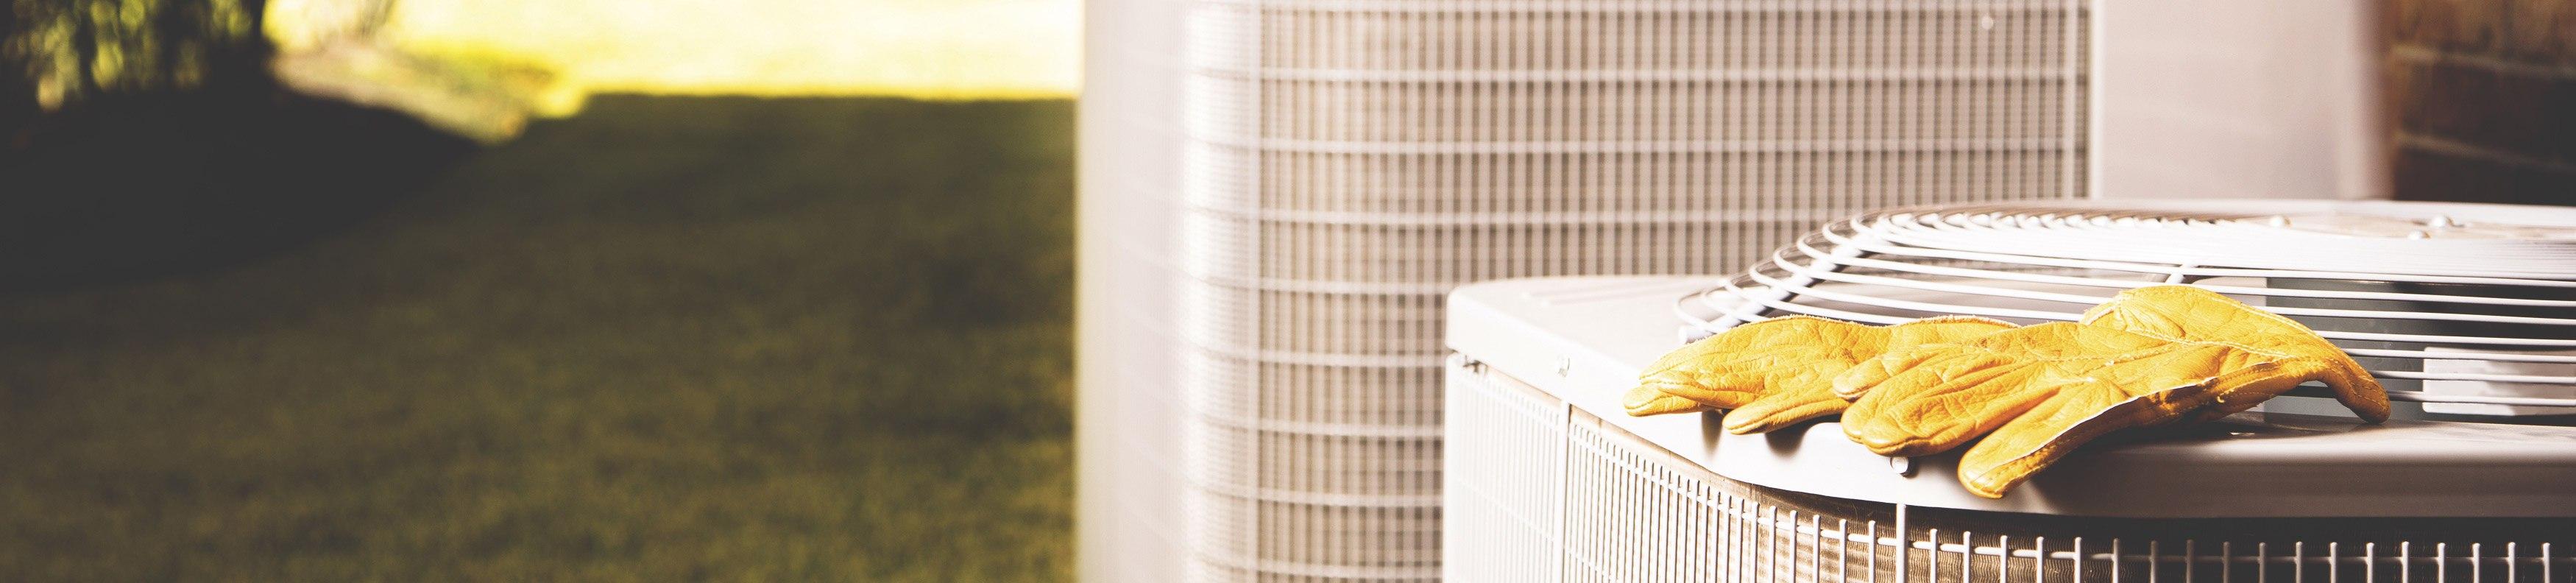 Brandt-Heating-Air-Conditioning-Iowa-City-slider-image1